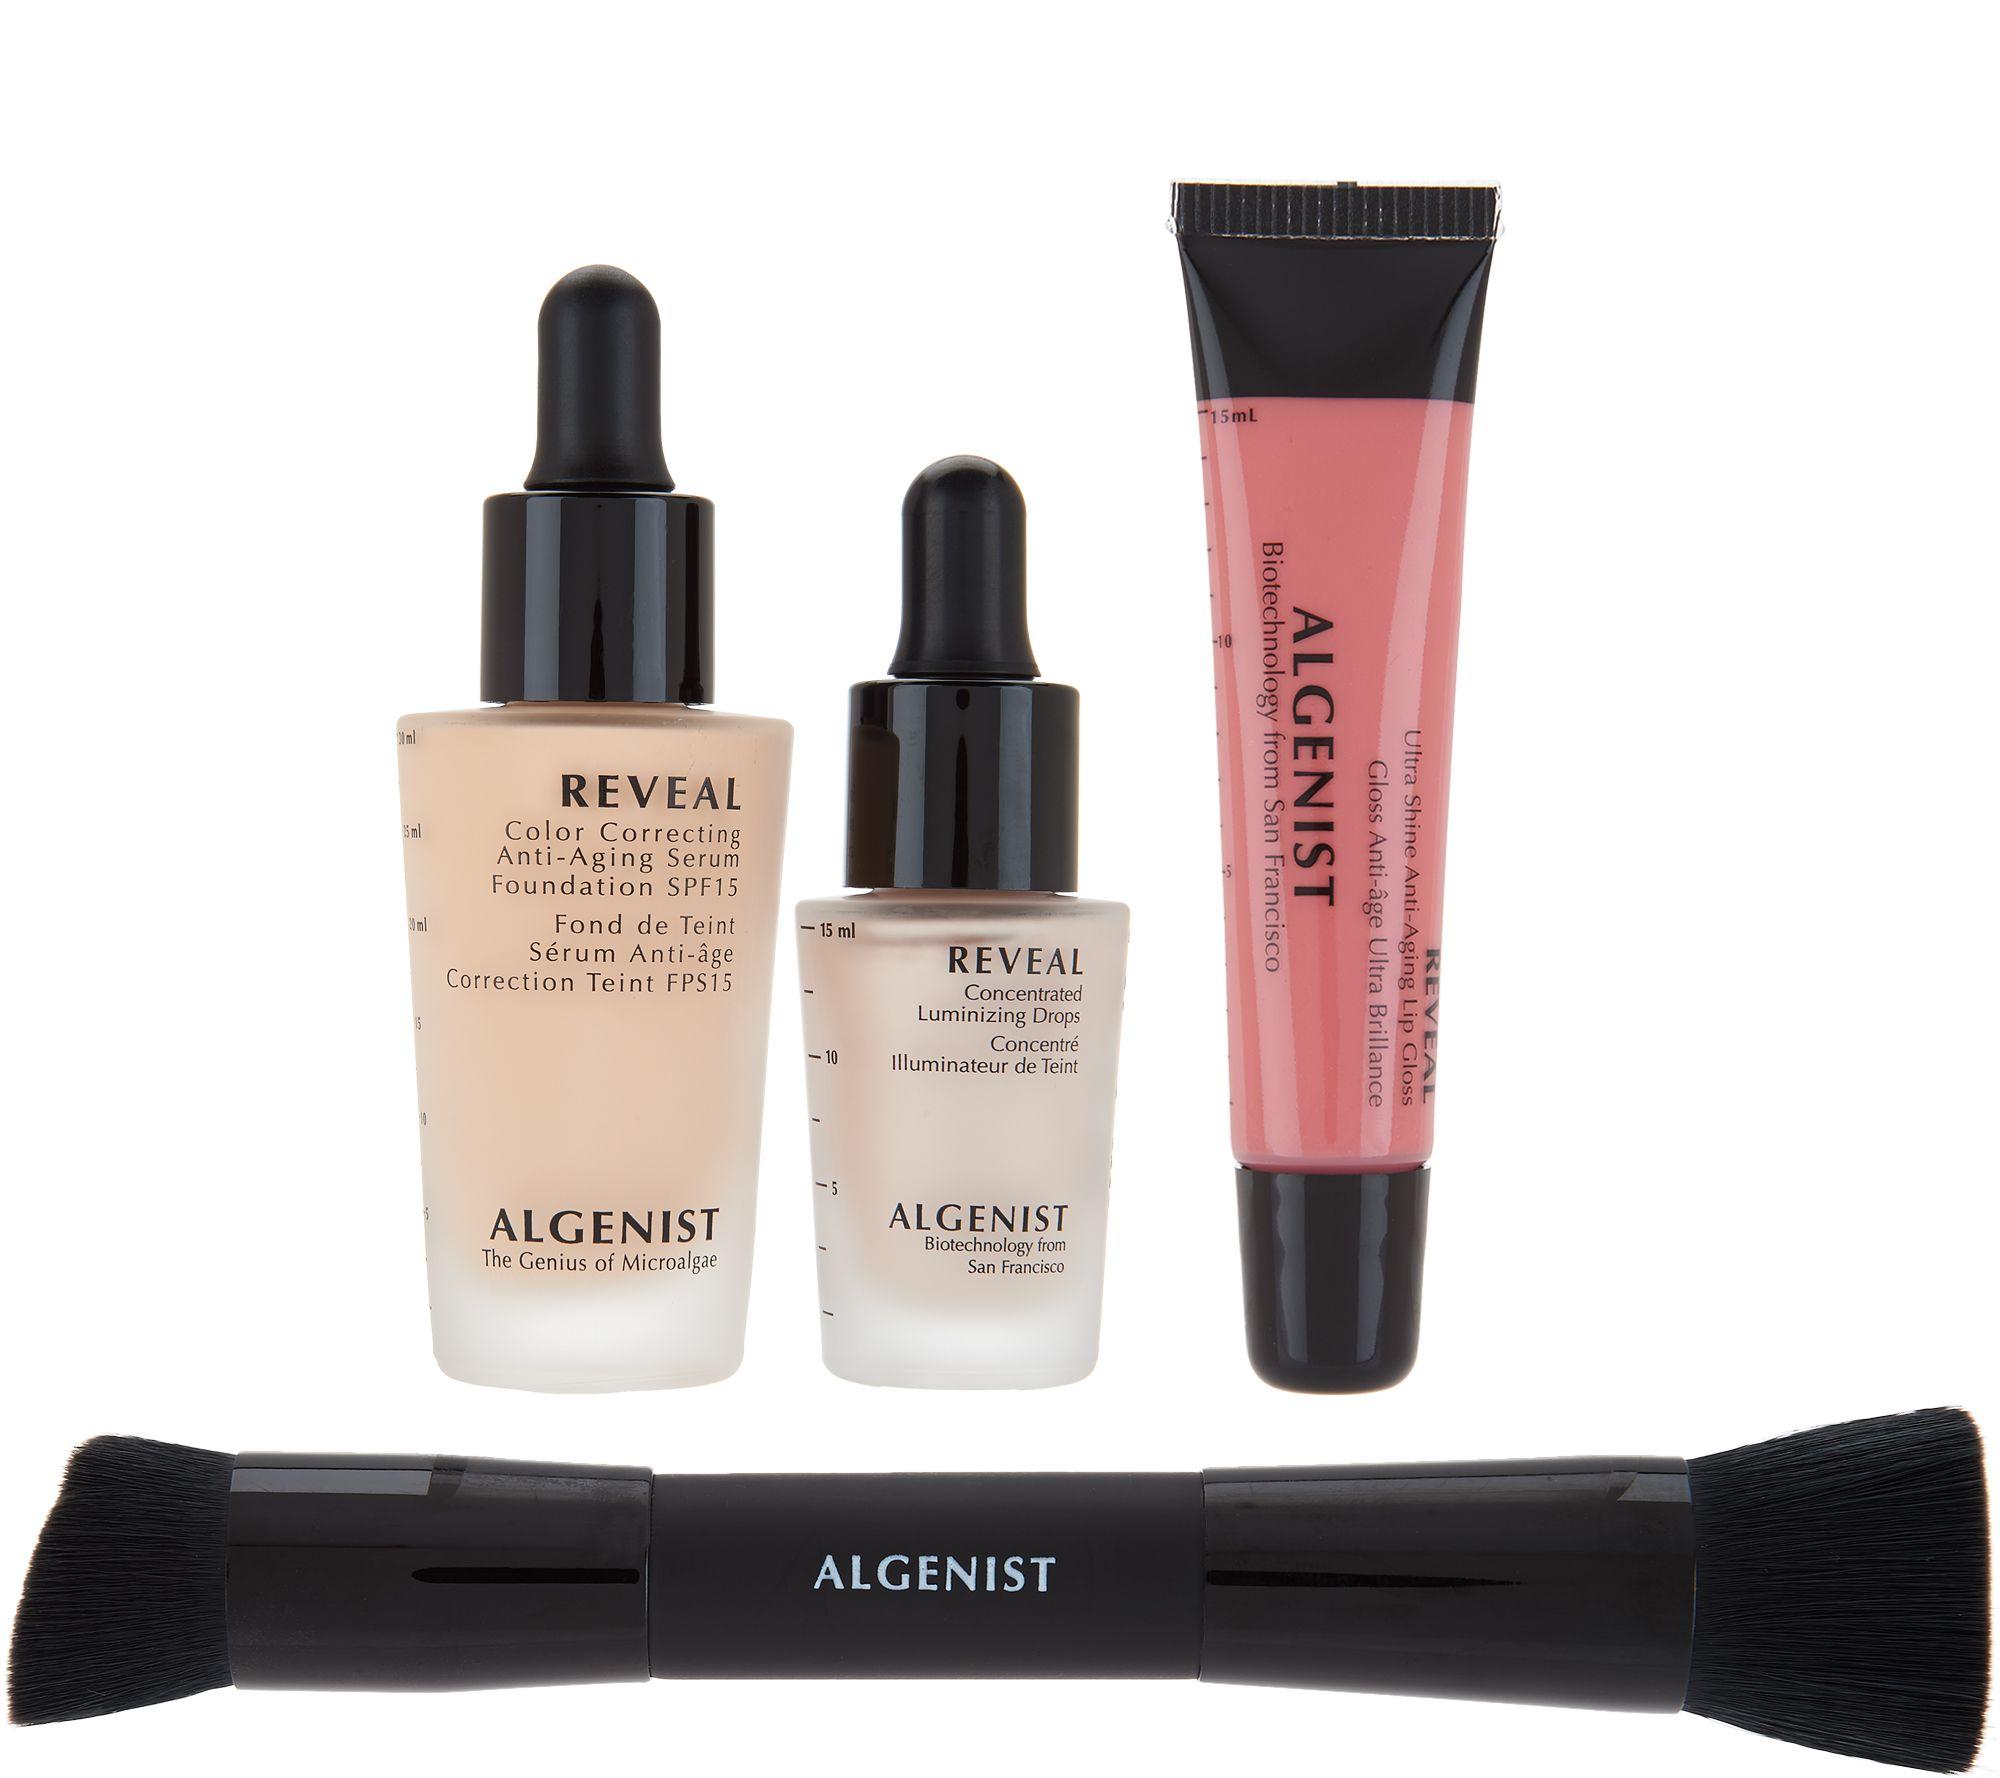 algenist reveal reviews